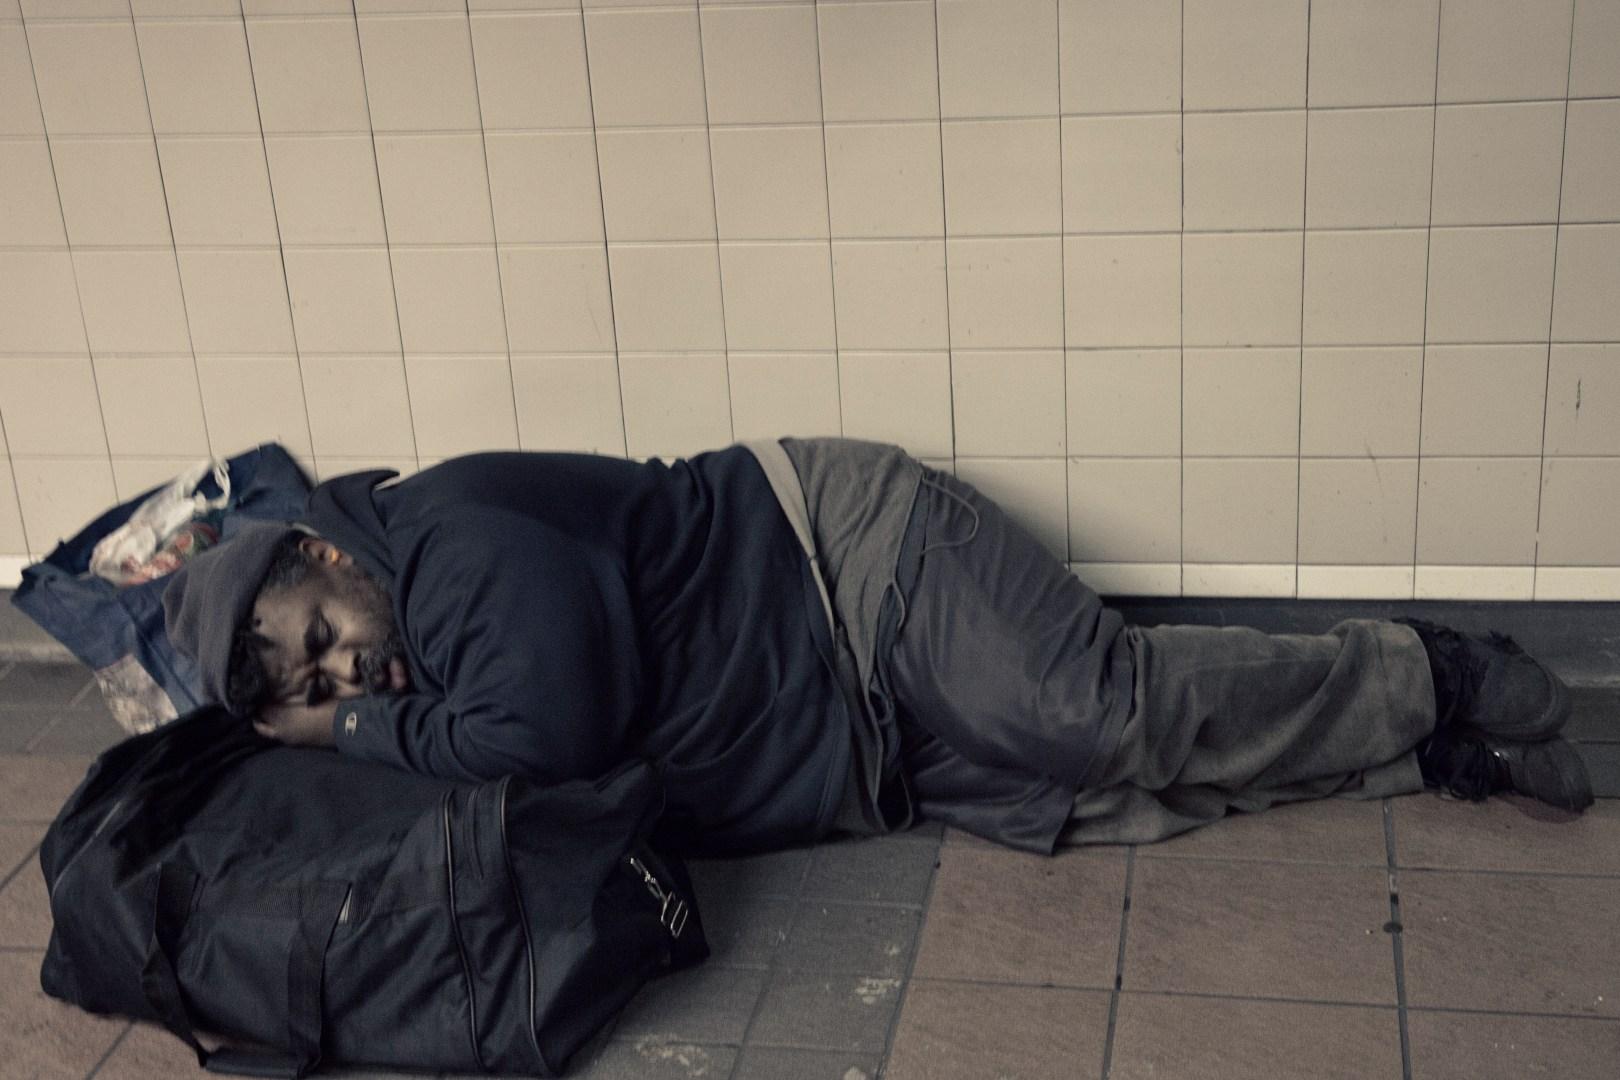 A photo of New York City Subway Sleeper